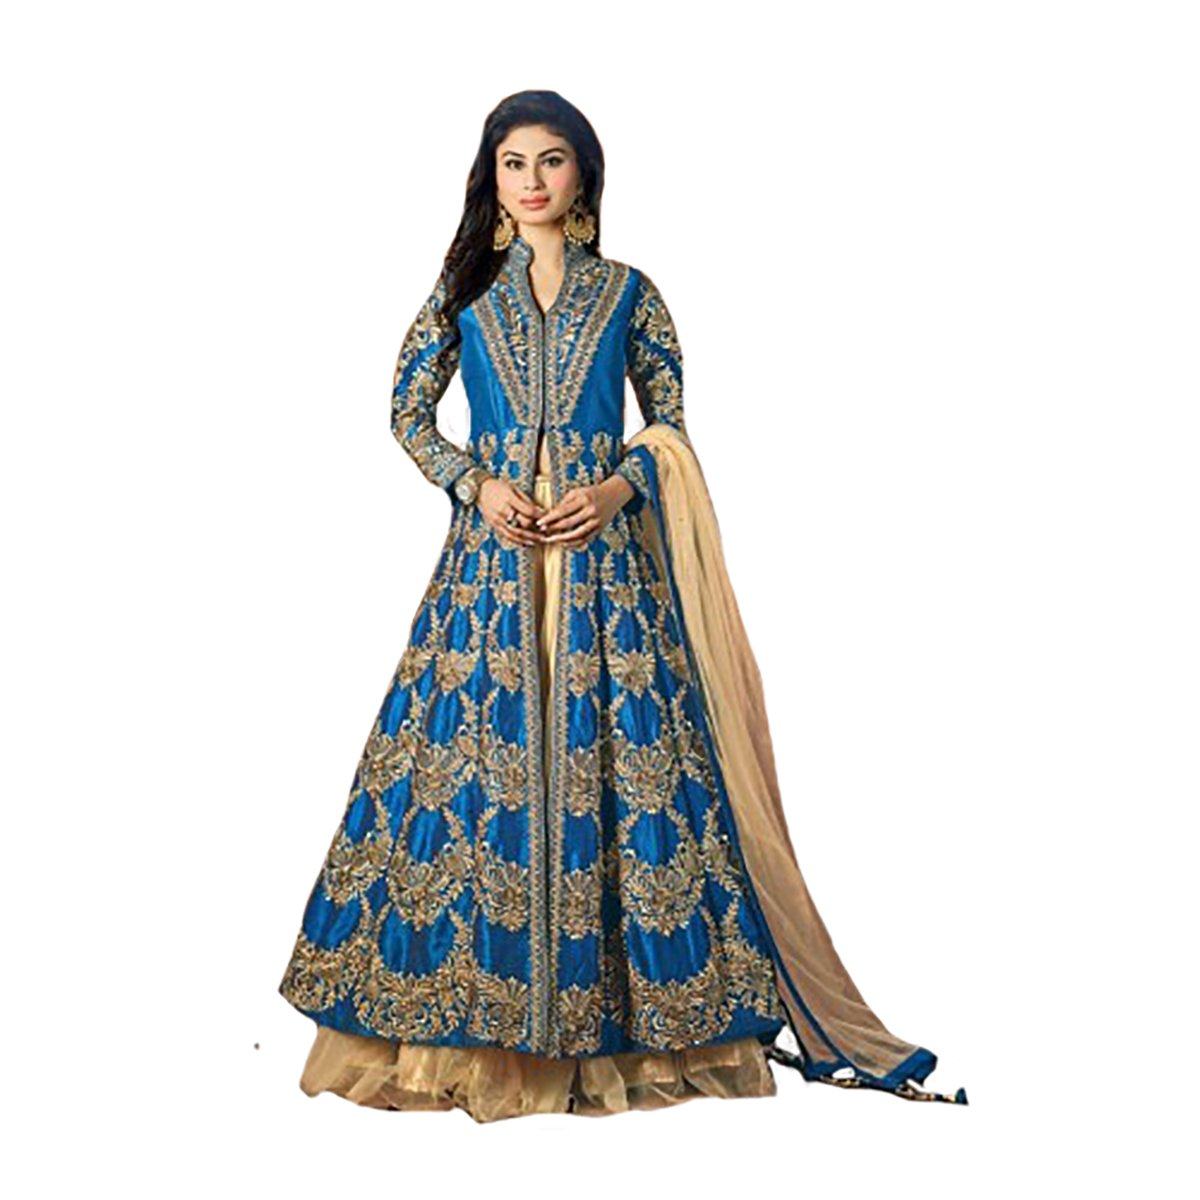 Royal bluee Muslim Silk Handwork Ethnic Skirt Syle Anarkali Kaftan Wedding Salwar Kameez Suit Semi Stitched Indian Pakistani Hit